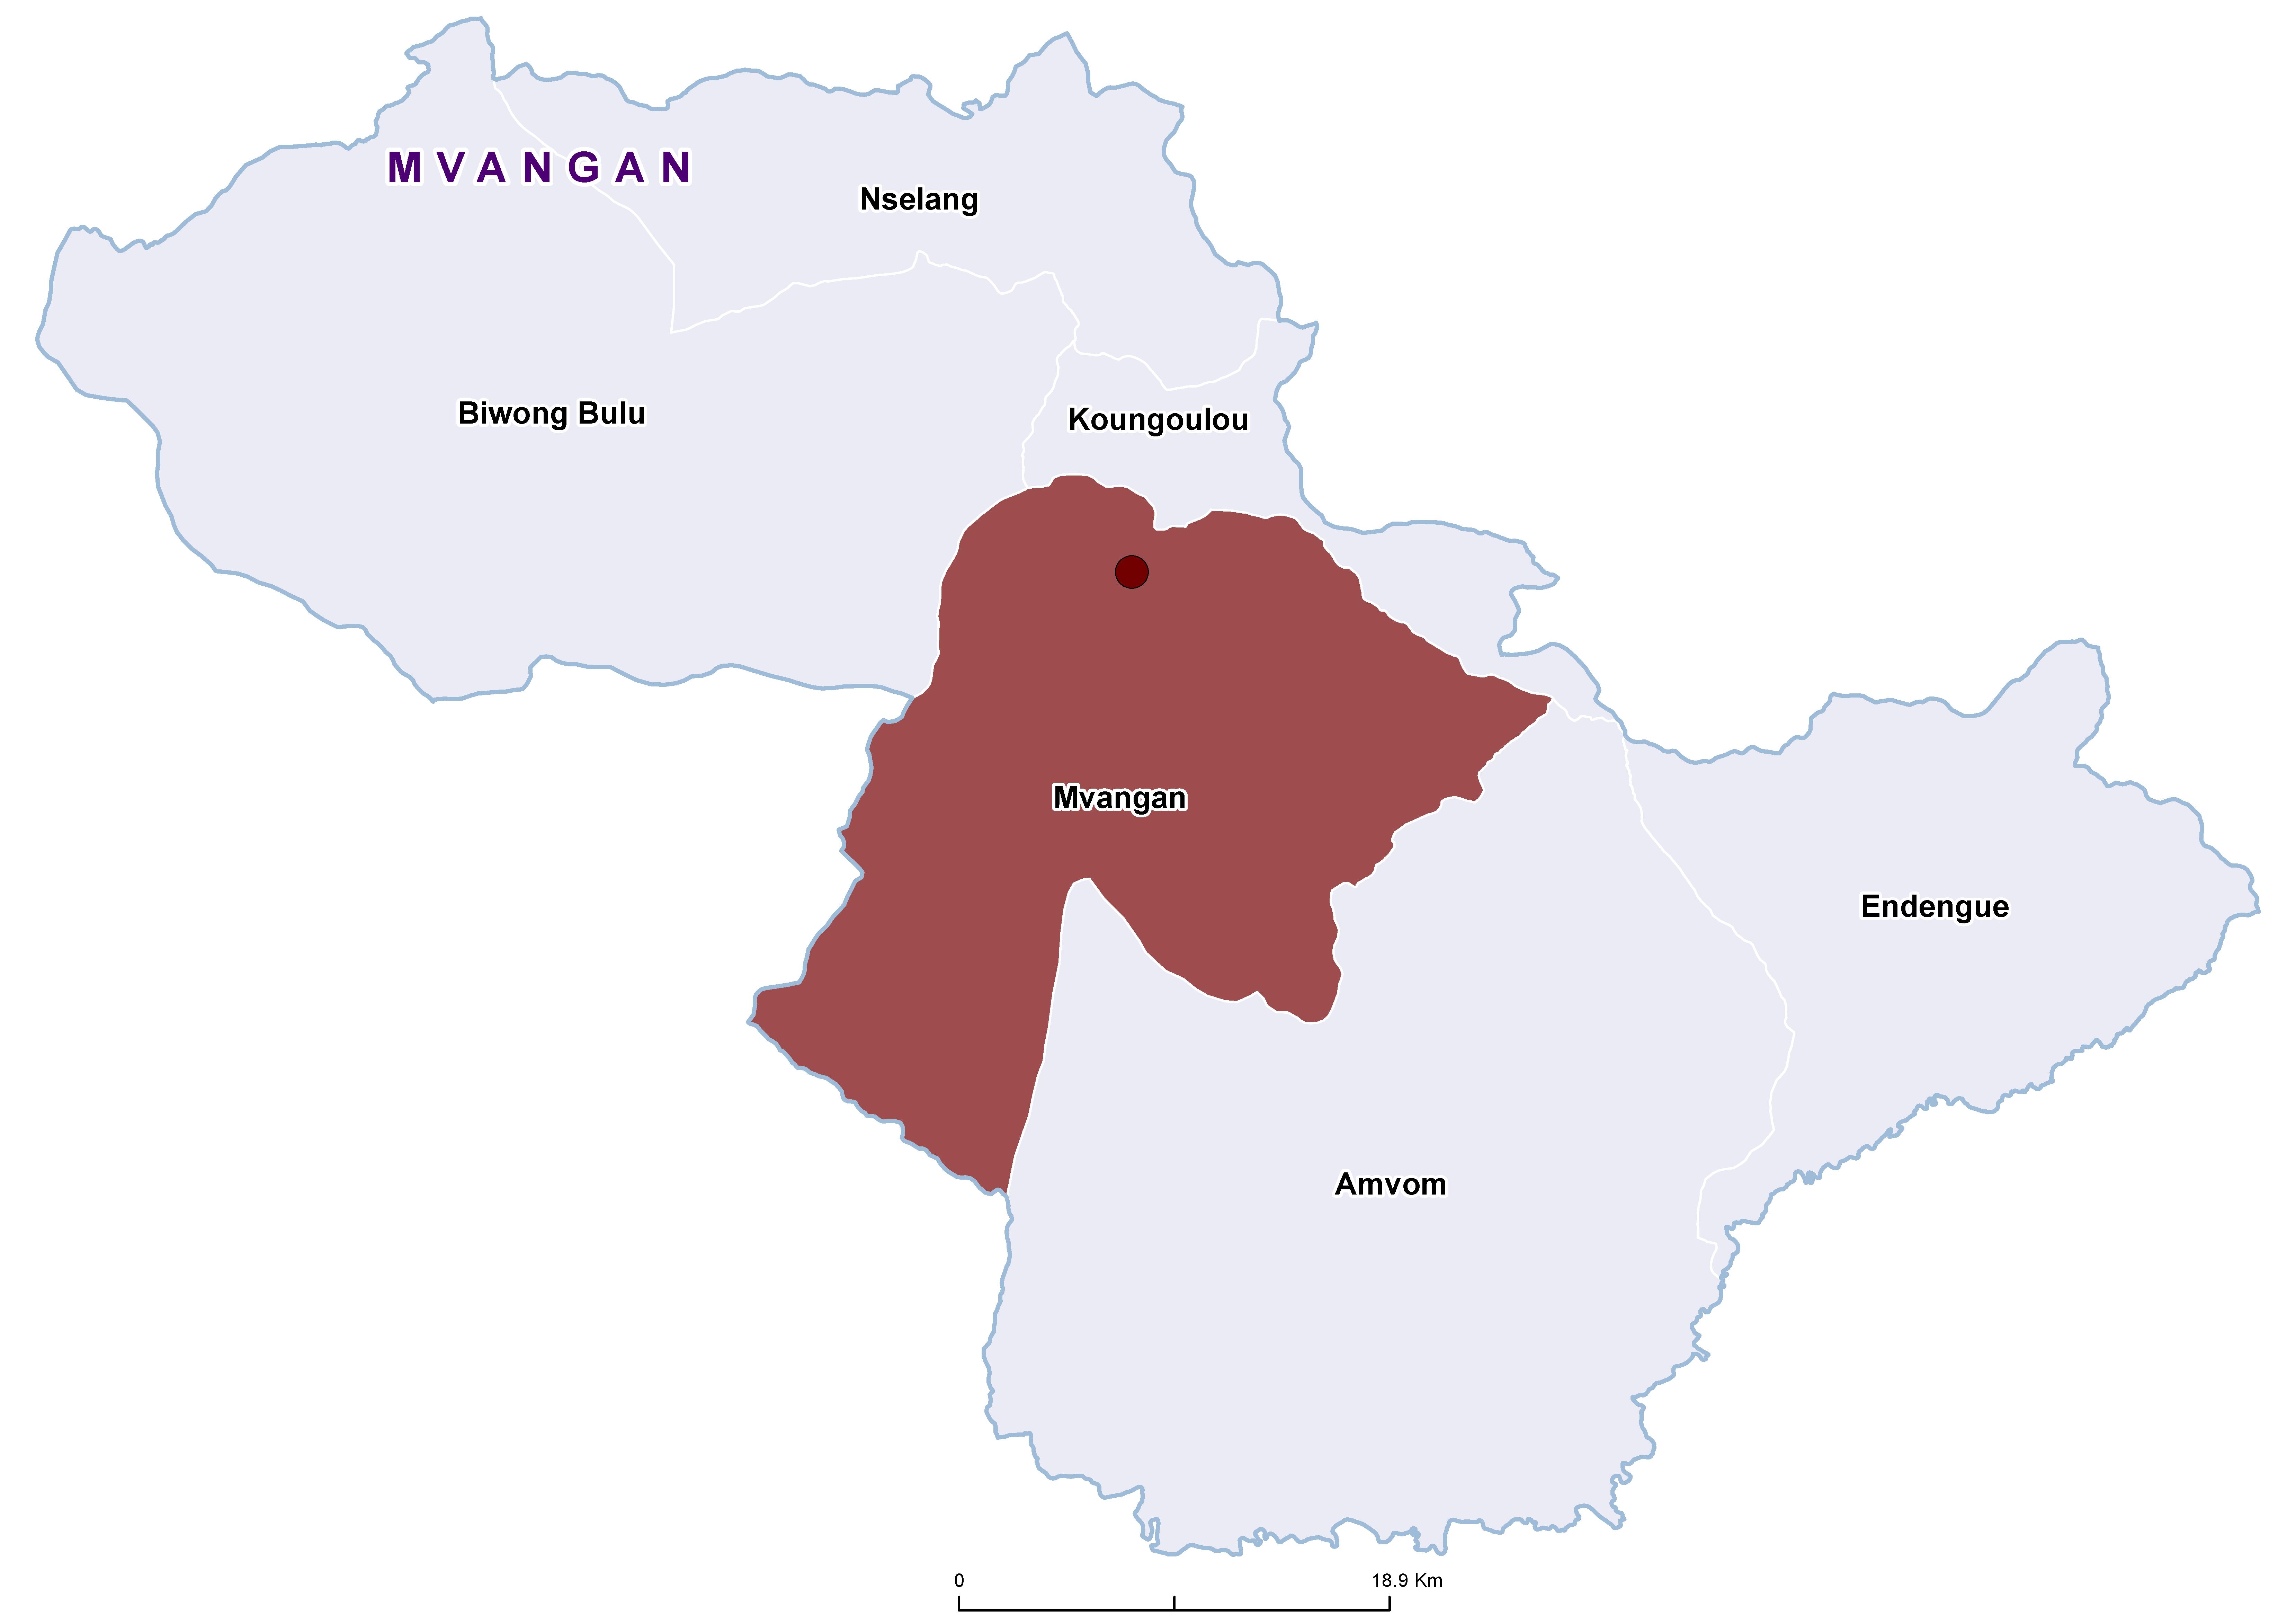 Mvangan STH 20100001